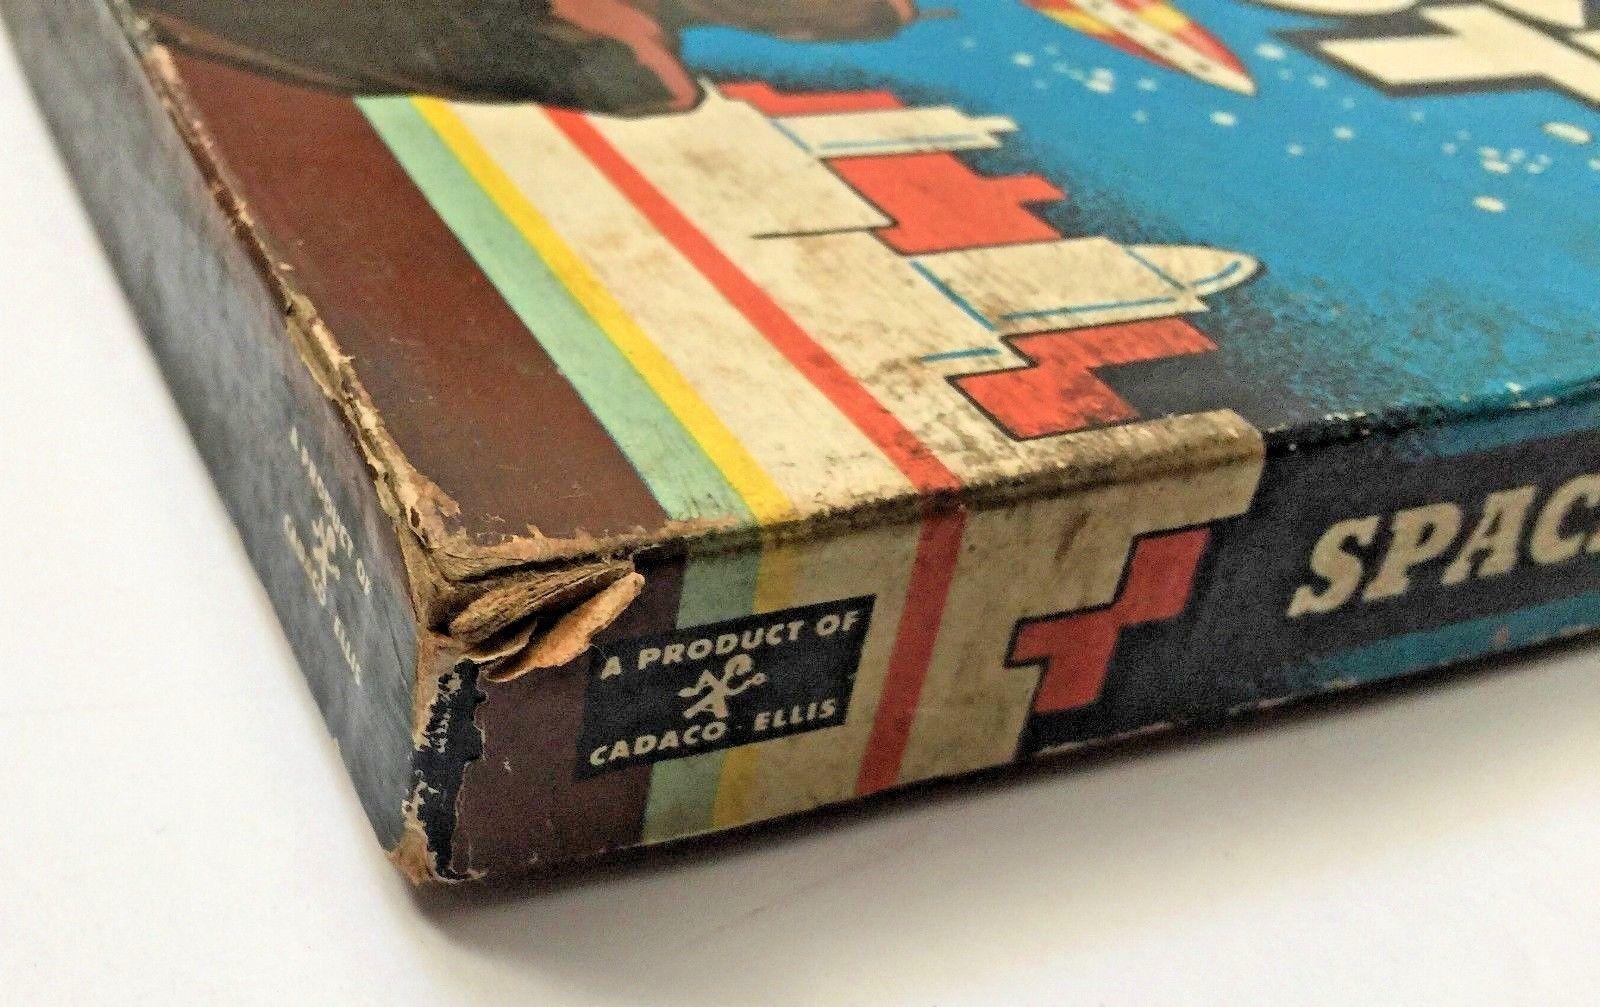 VTG Vintage 1951 Space Pilot by Cadaco Ellis Board Game HARD TO FIND HTF image 7